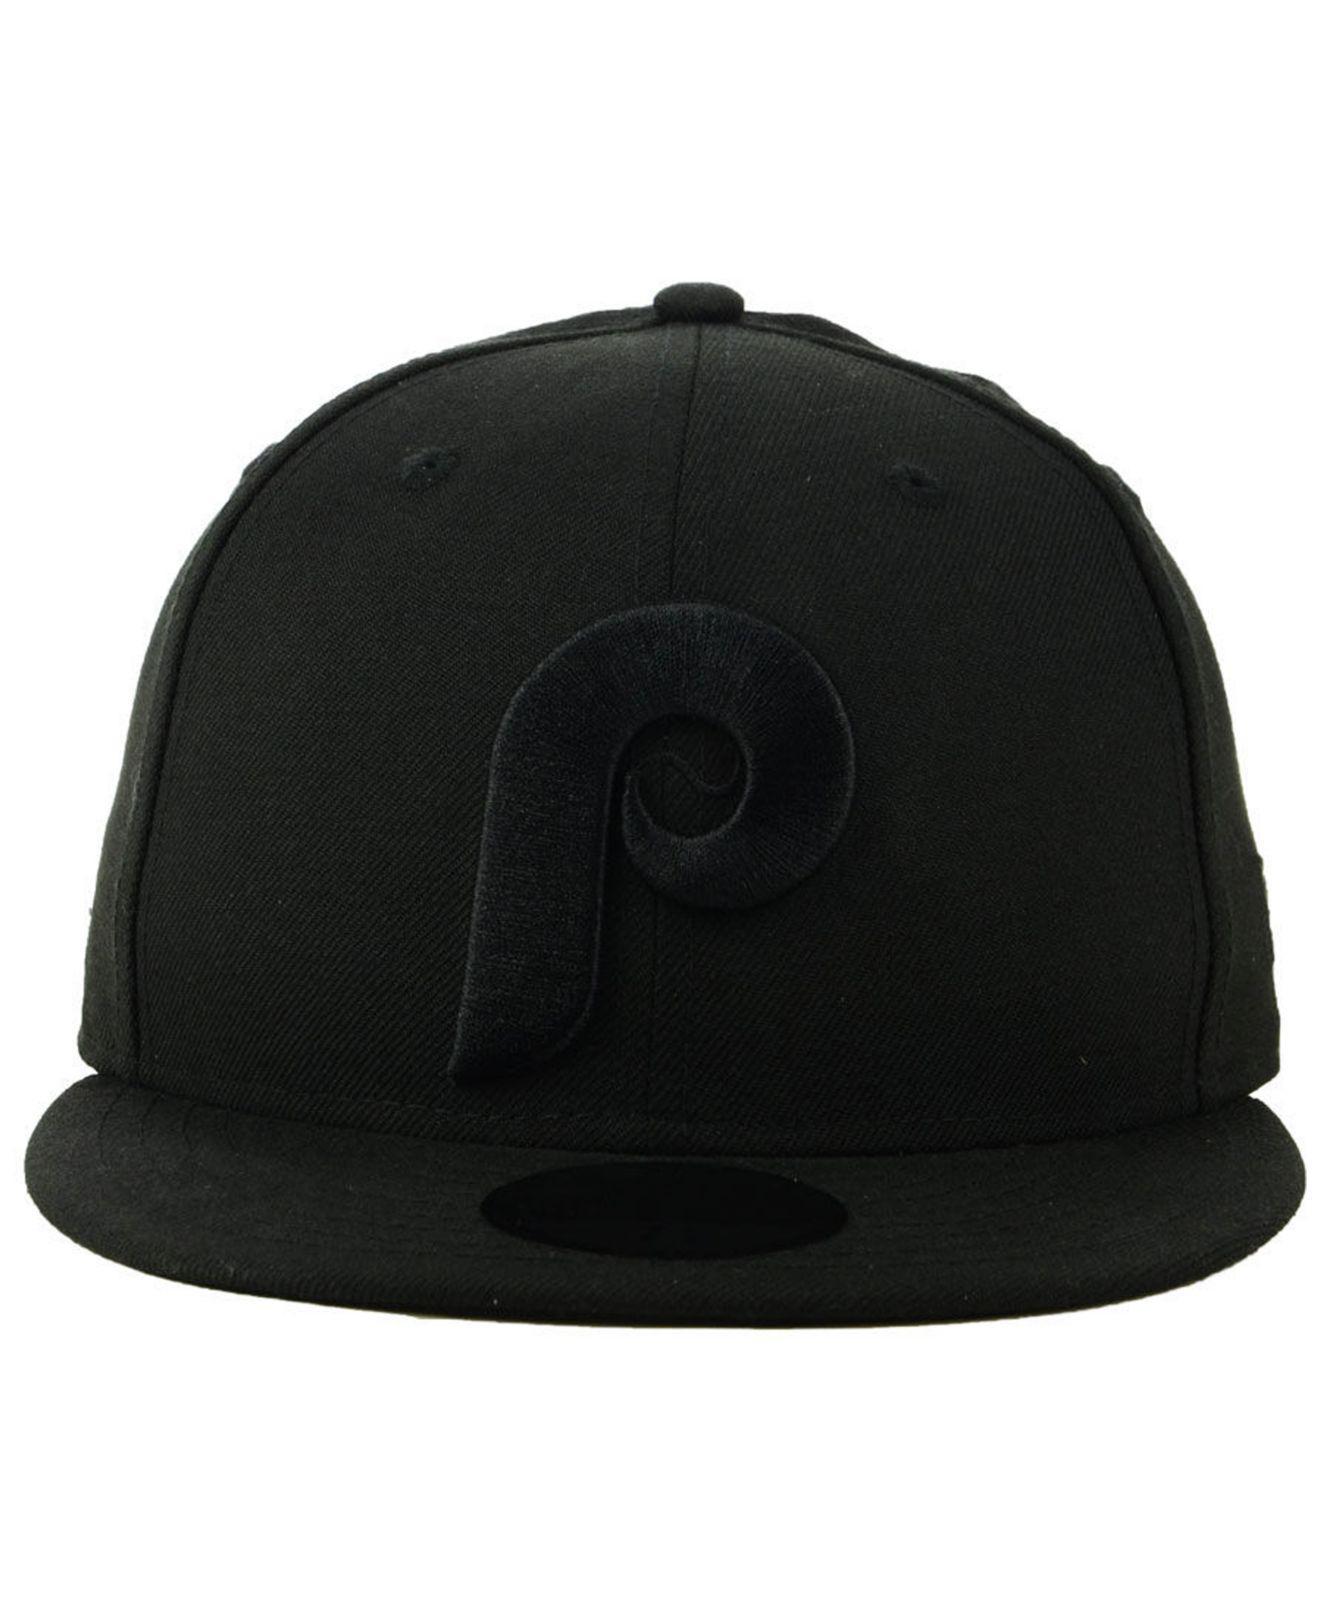 90ea967699427 ... germany lyst ktz philadelphia phillies blackout 59fifty fitted cap in  black for men 3ece1 b339d